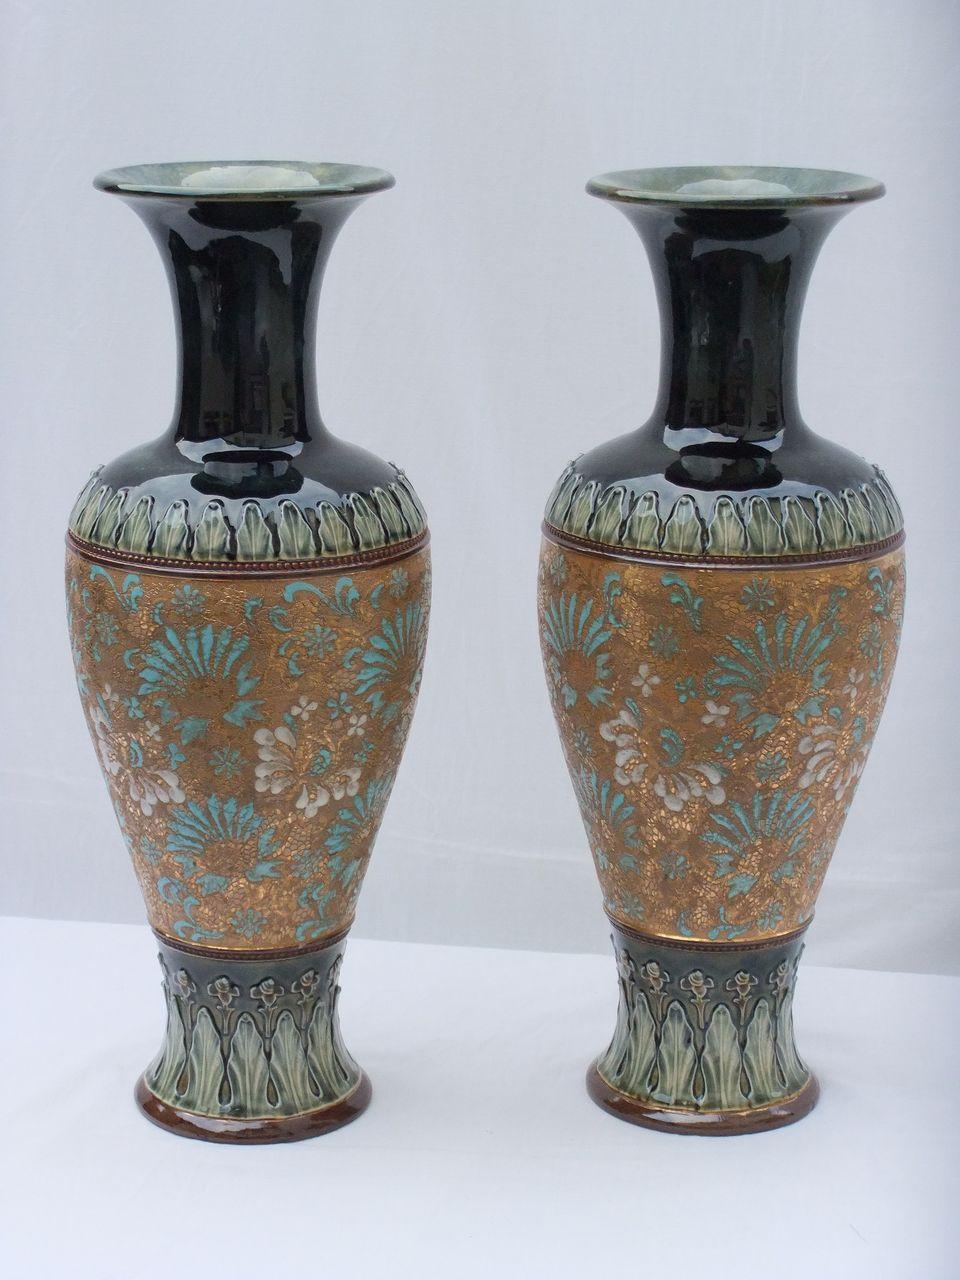 Antique large royal doulton vases doulton slaters patent antique large royal doulton vases doulton slaters patent reviewsmspy